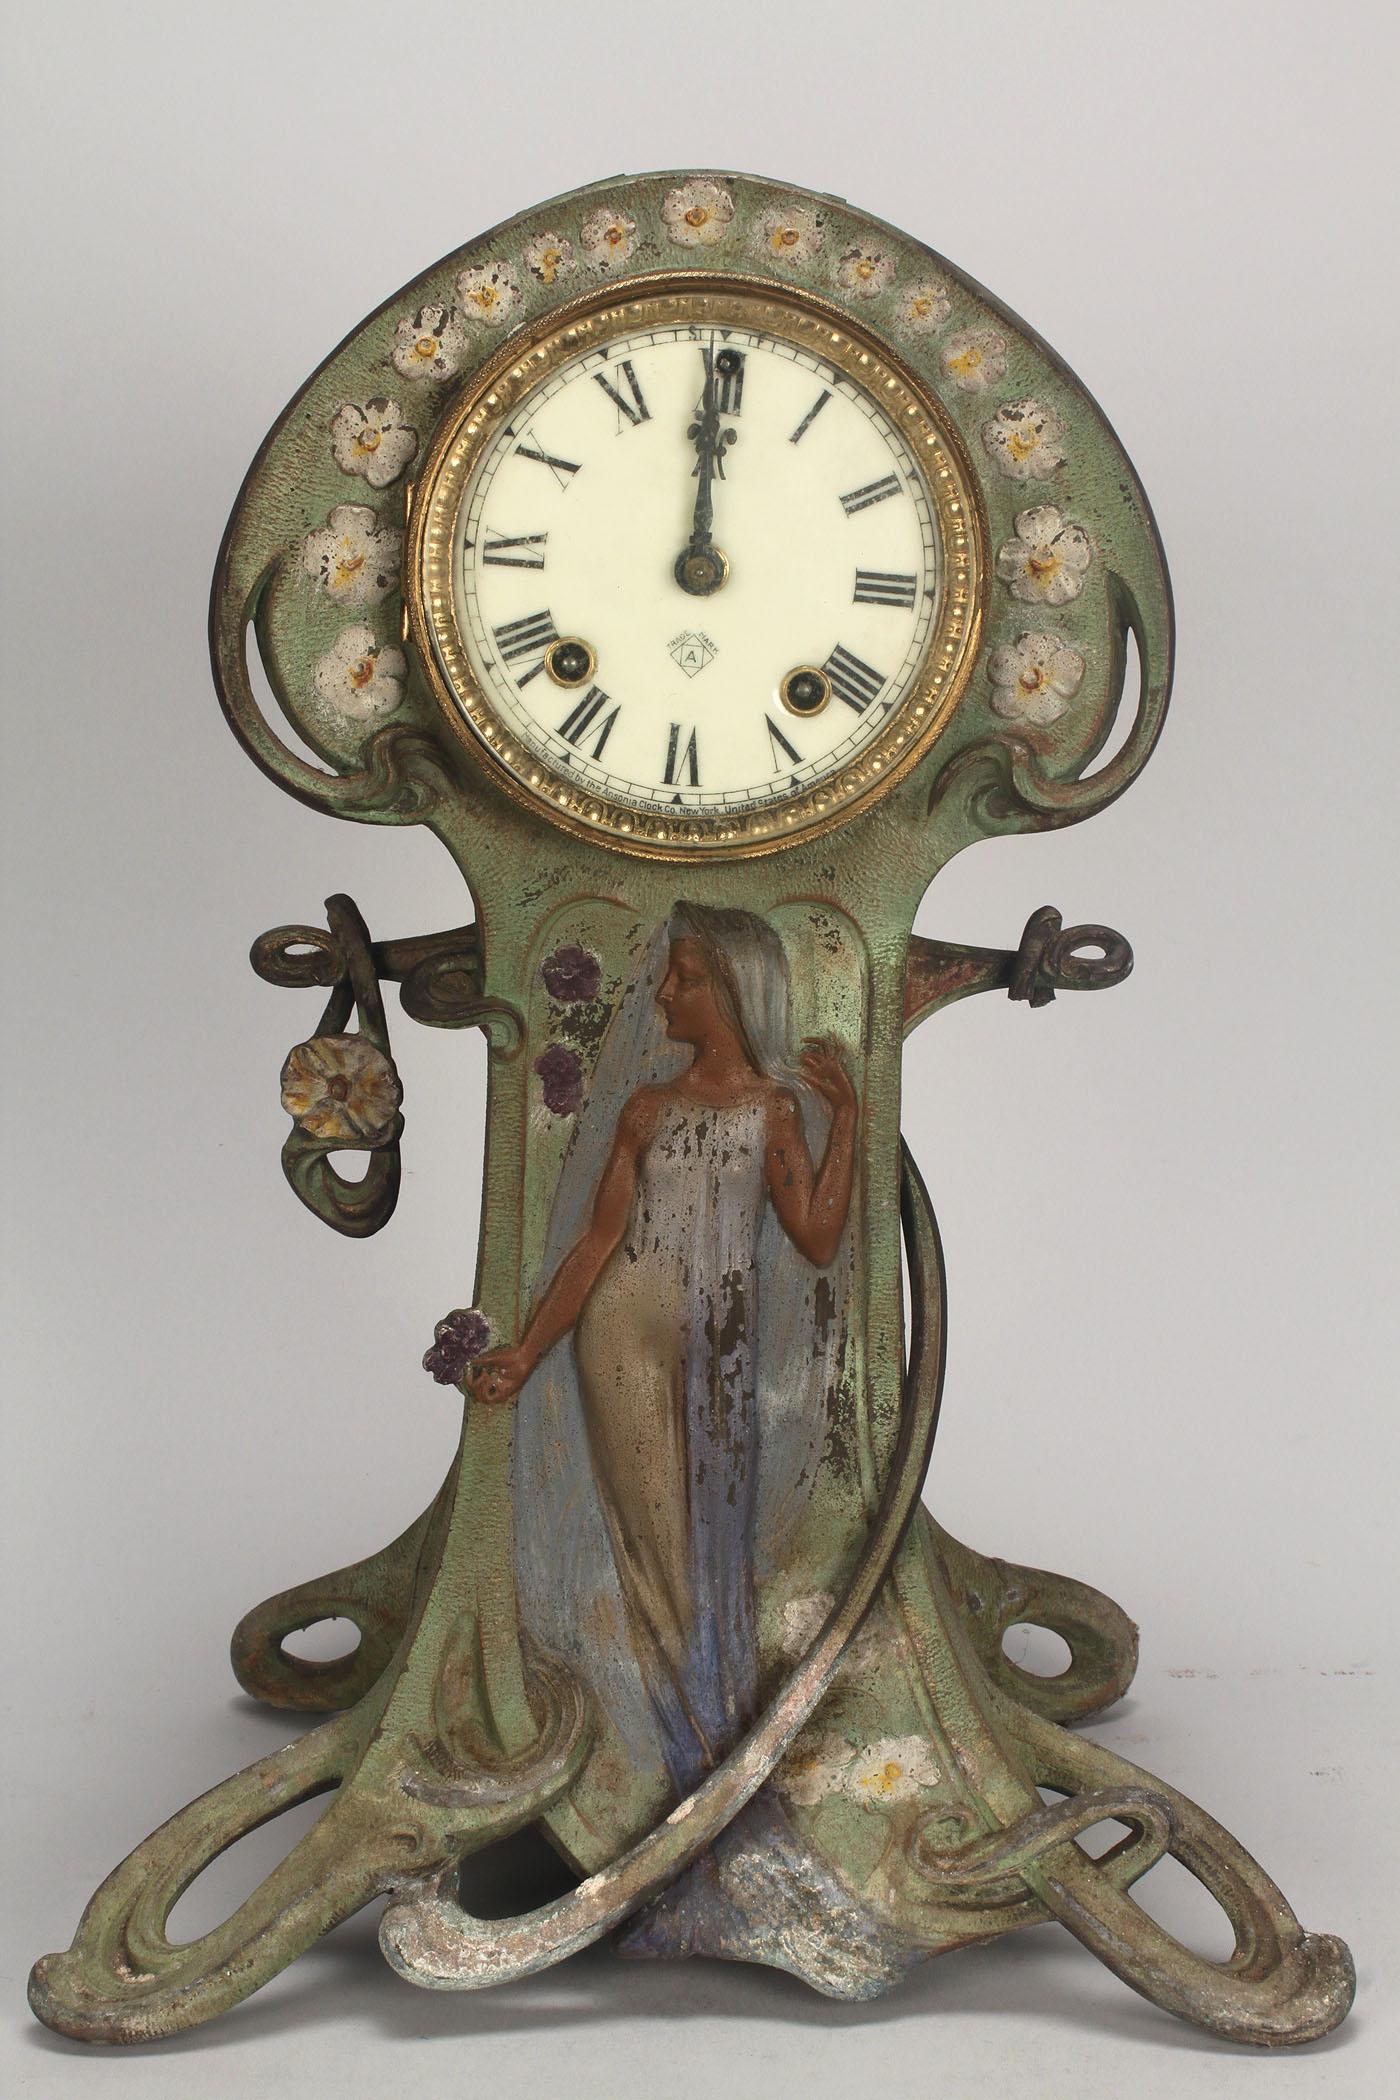 Lot 718 2 Ansonia Clocks Art Nouveau Amp Mantle W Brass